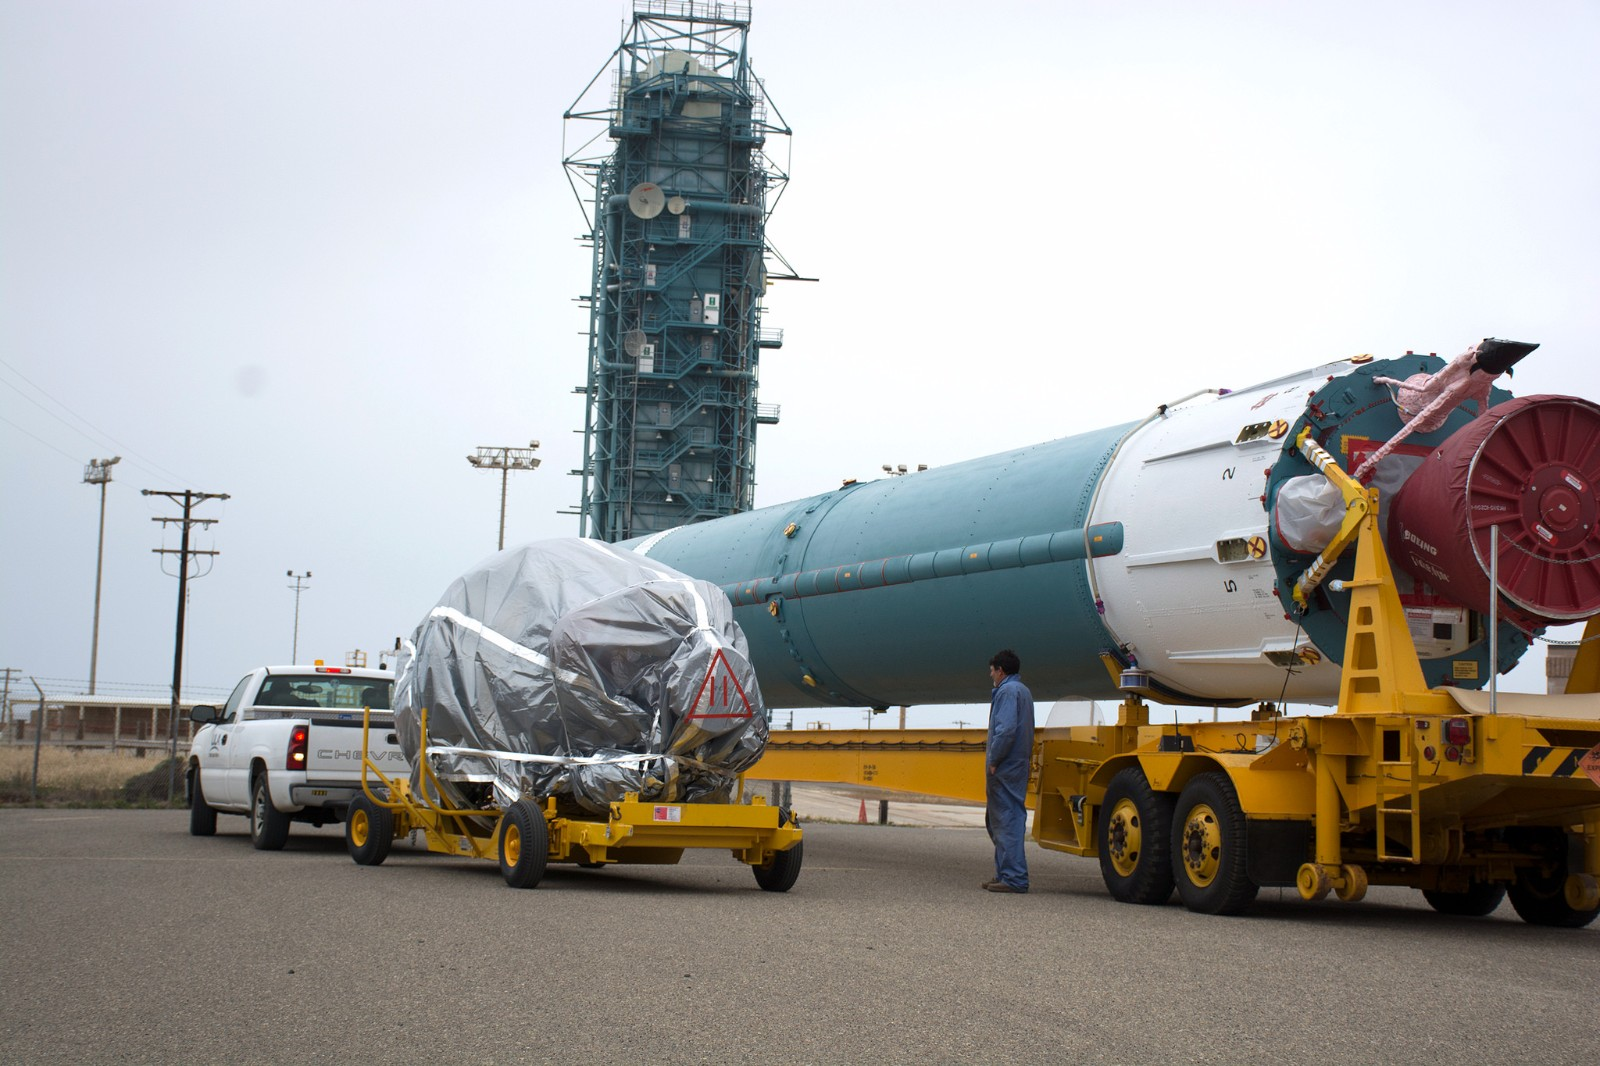 Penultimate Delta II Rocket Stands Ready For JPSS-1